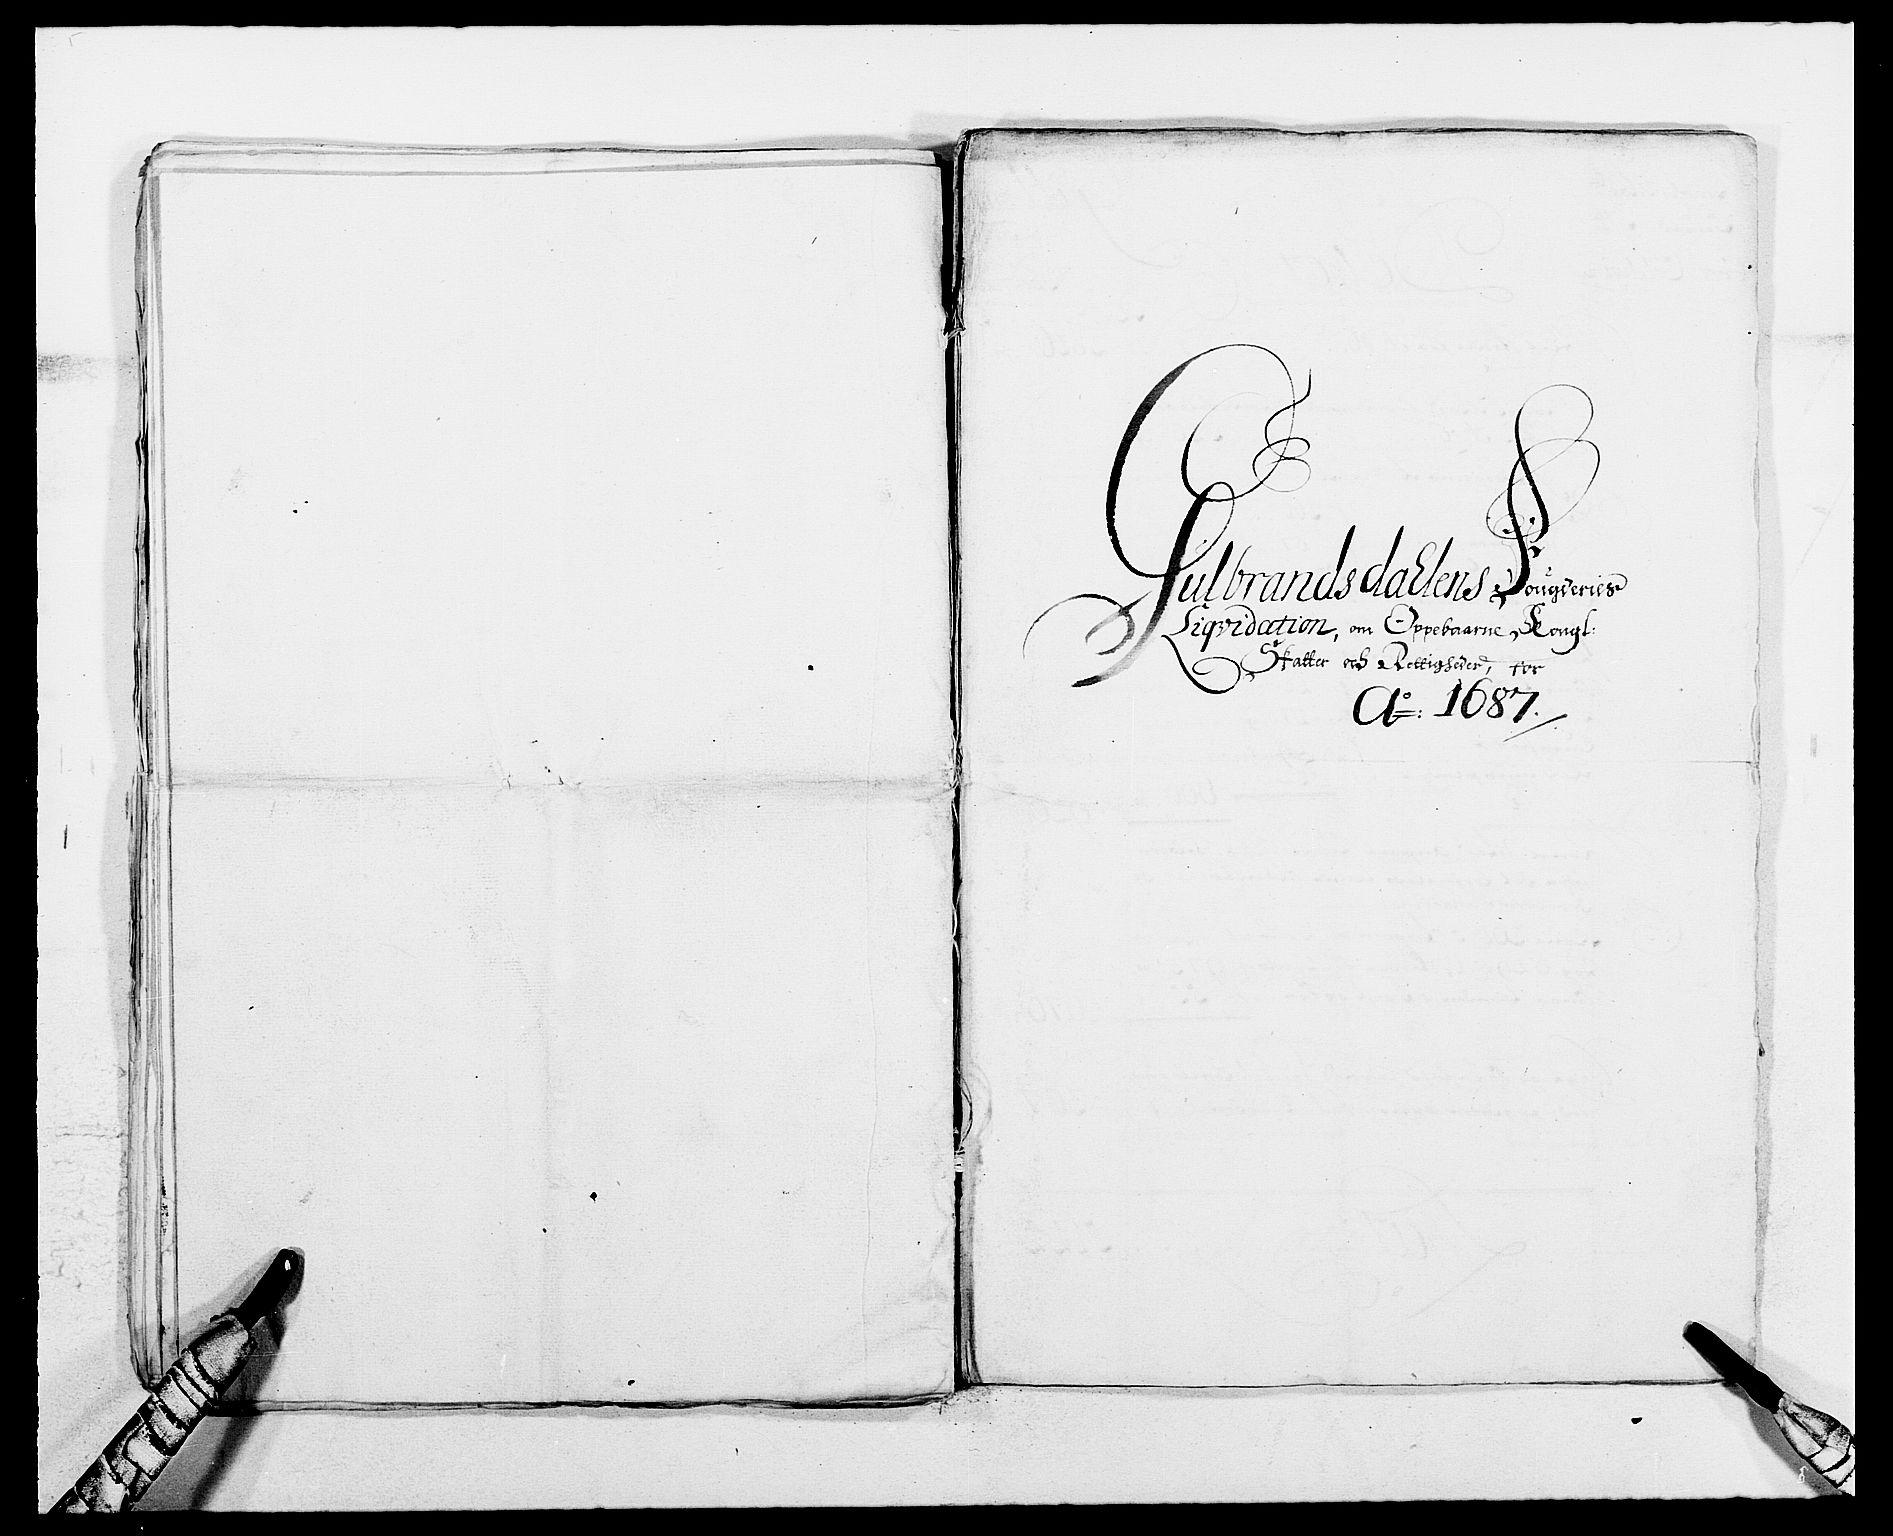 RA, Rentekammeret inntil 1814, Reviderte regnskaper, Fogderegnskap, R17/L1157: Fogderegnskap Gudbrandsdal, 1682-1689, s. 25